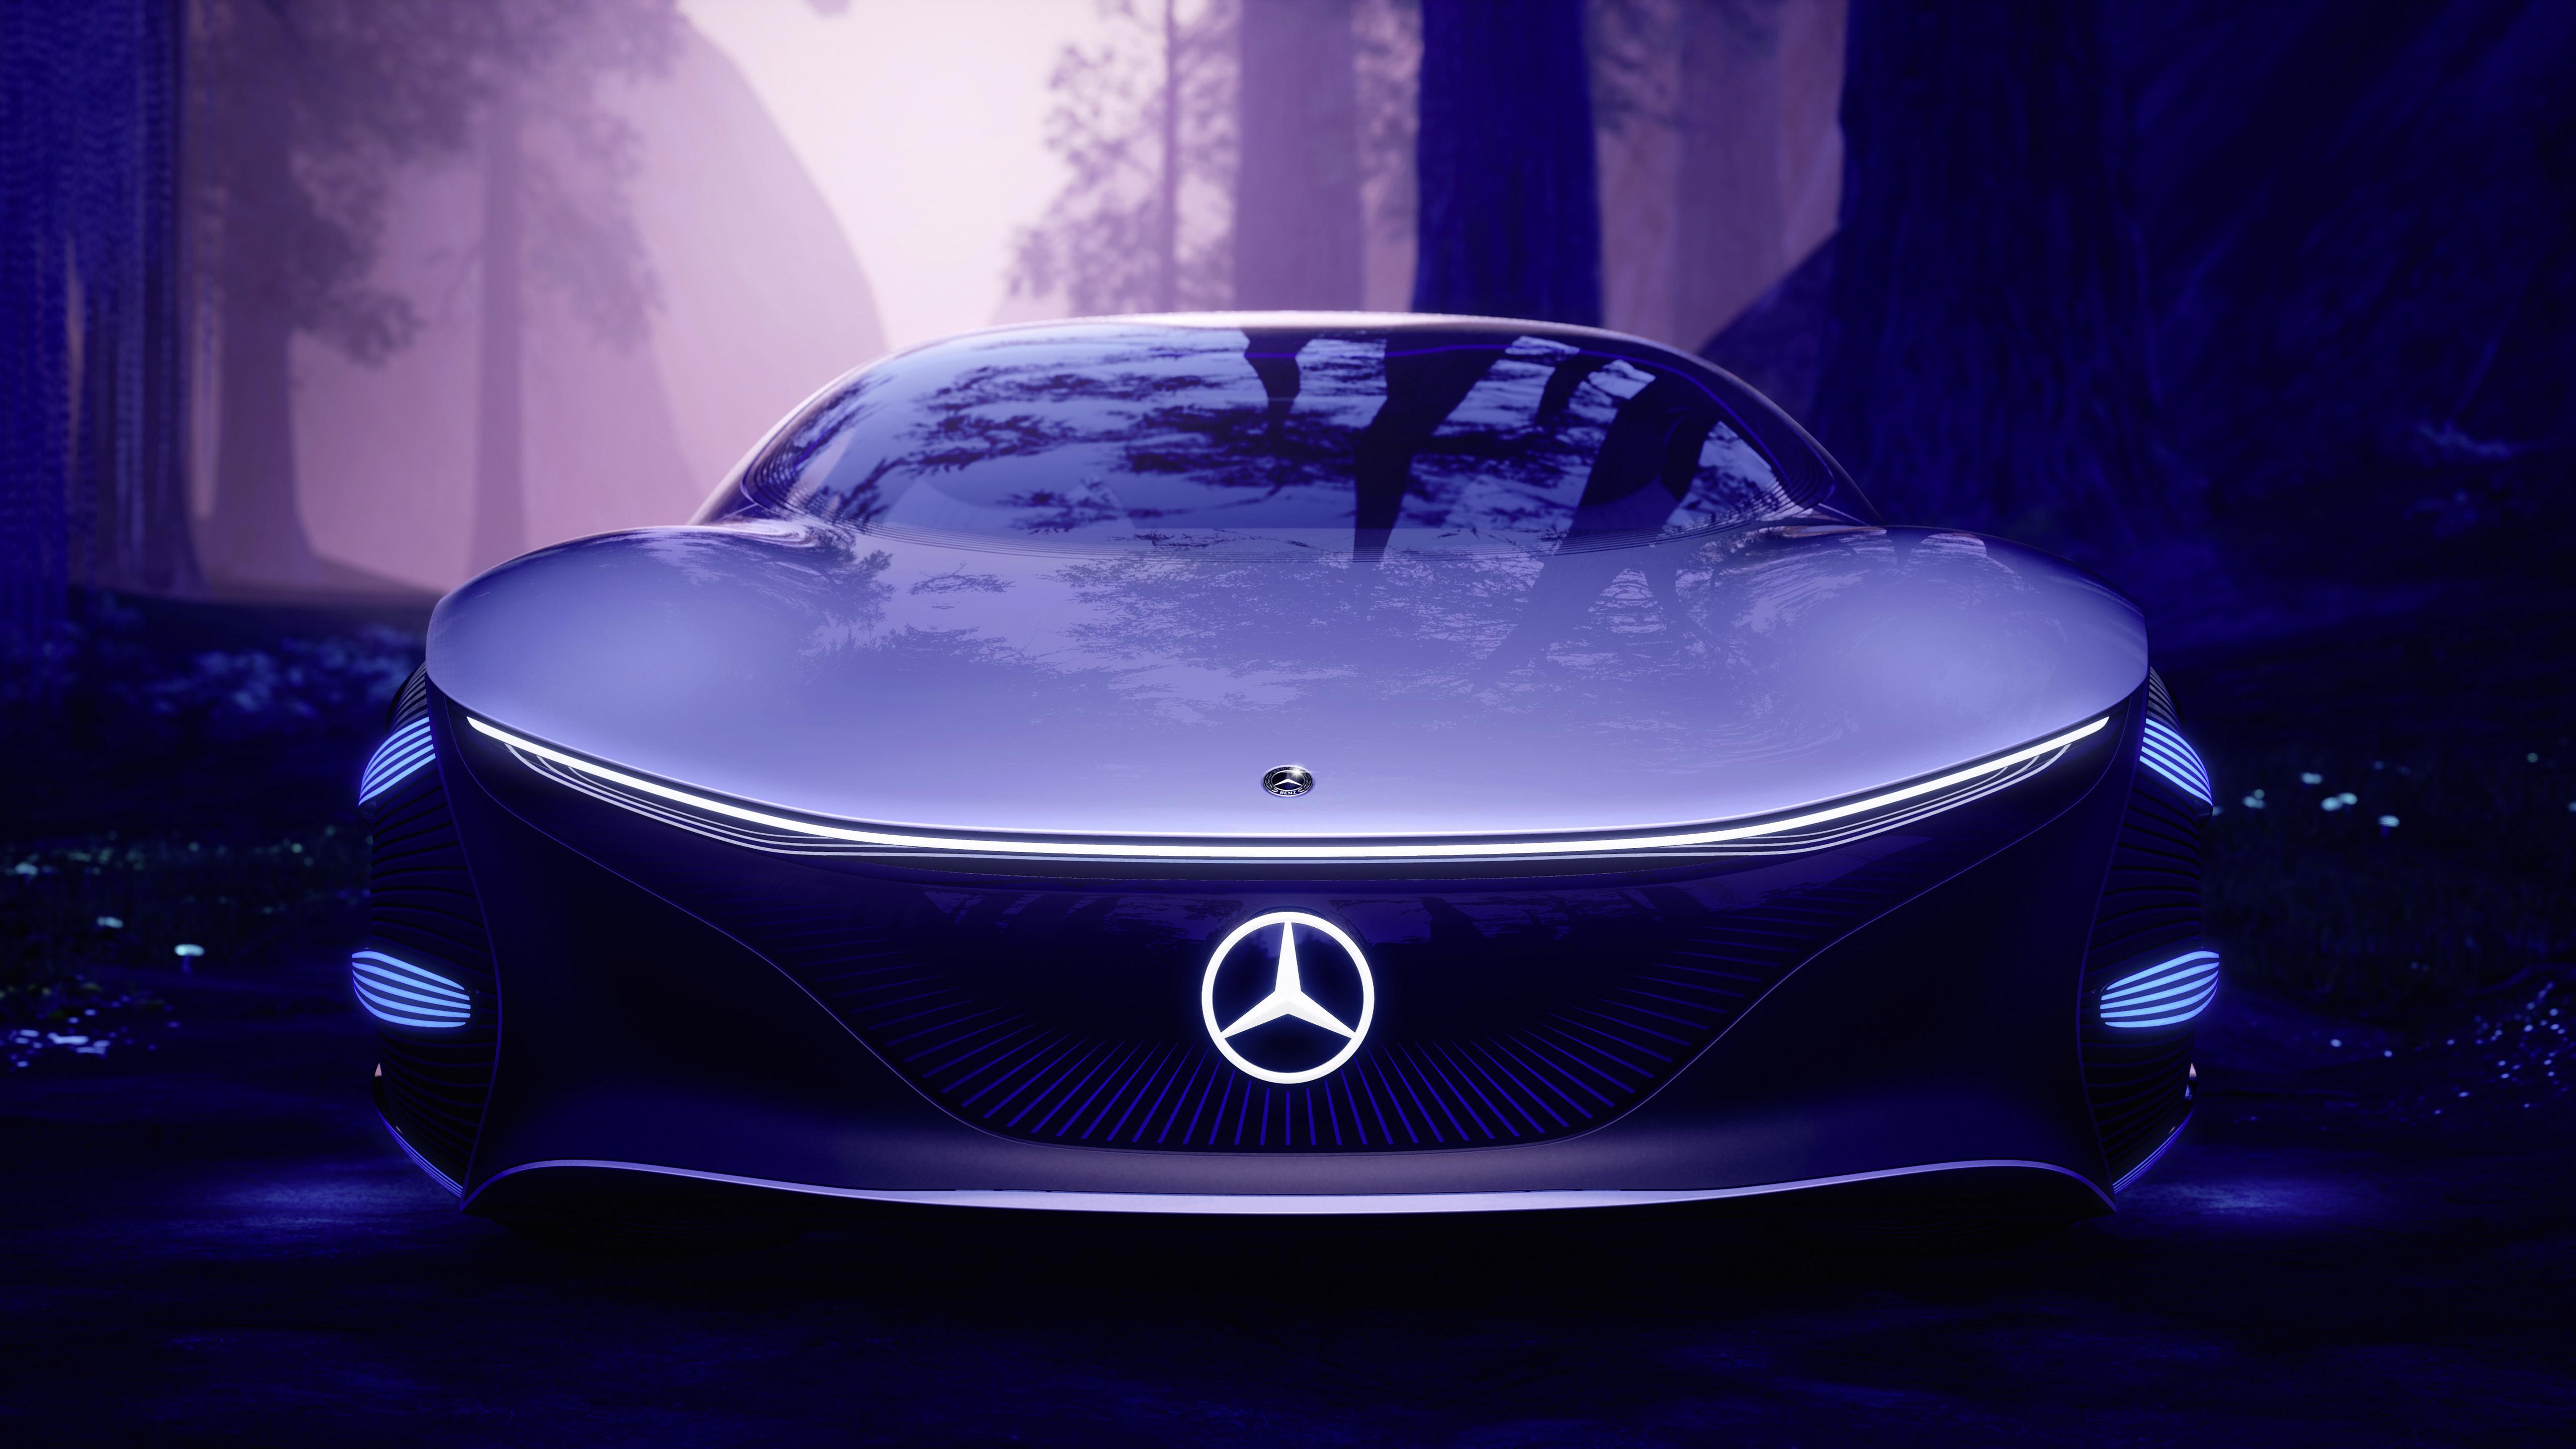 Mercedes Benz VISION AVTR 2020 5K 4 Wallpaper HD Car Wallpapers 5120x2880